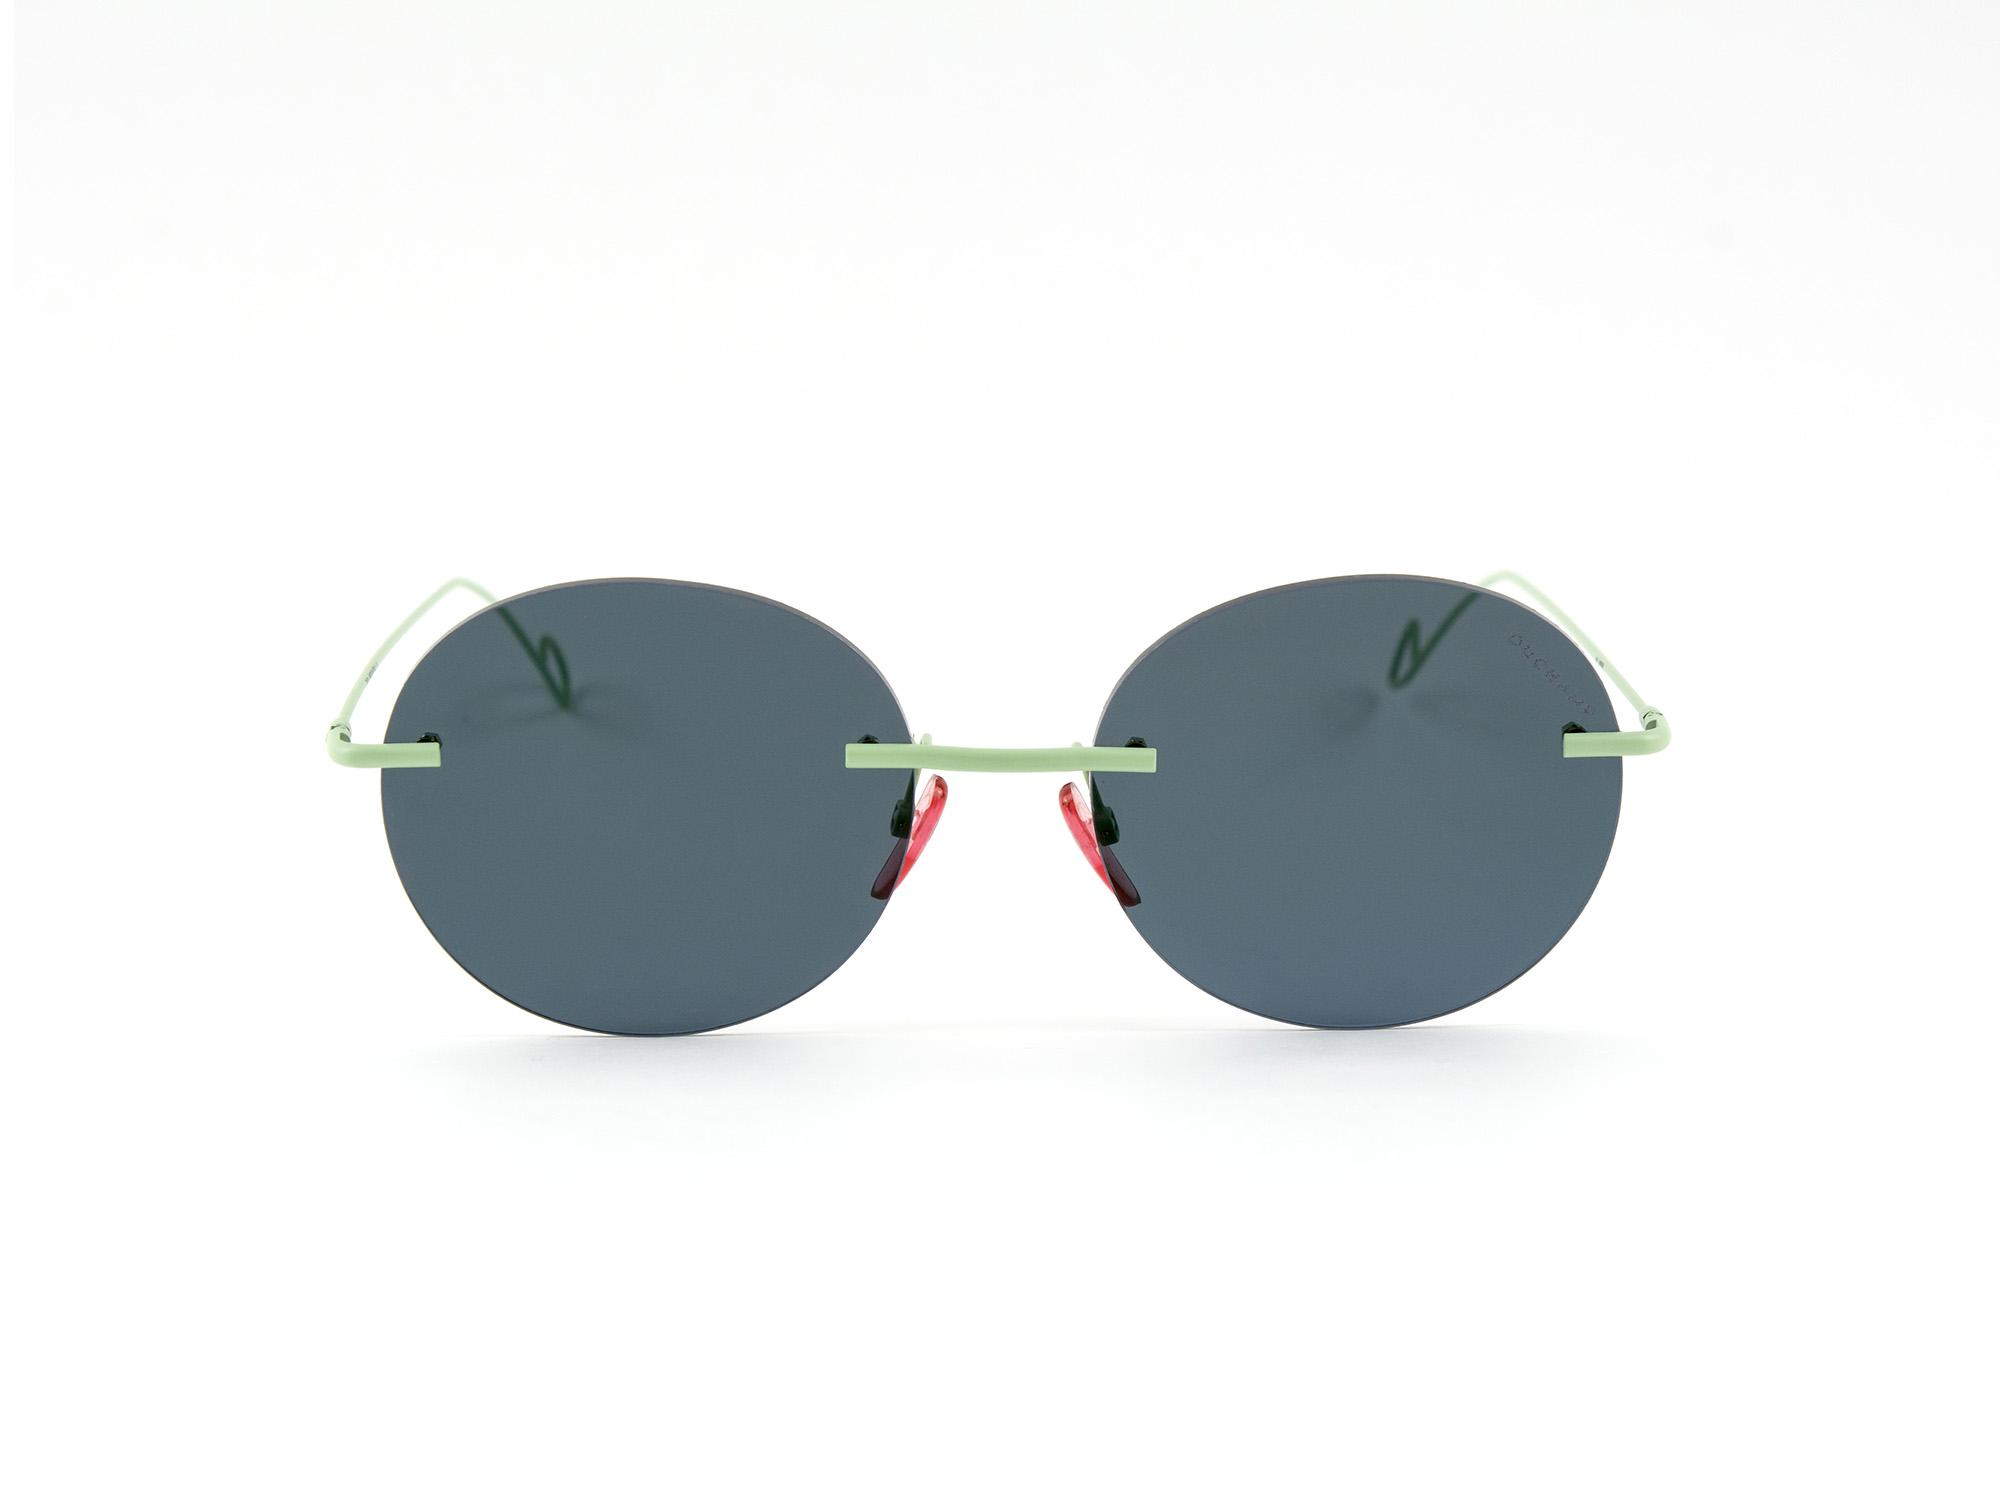 Duchamp fro green